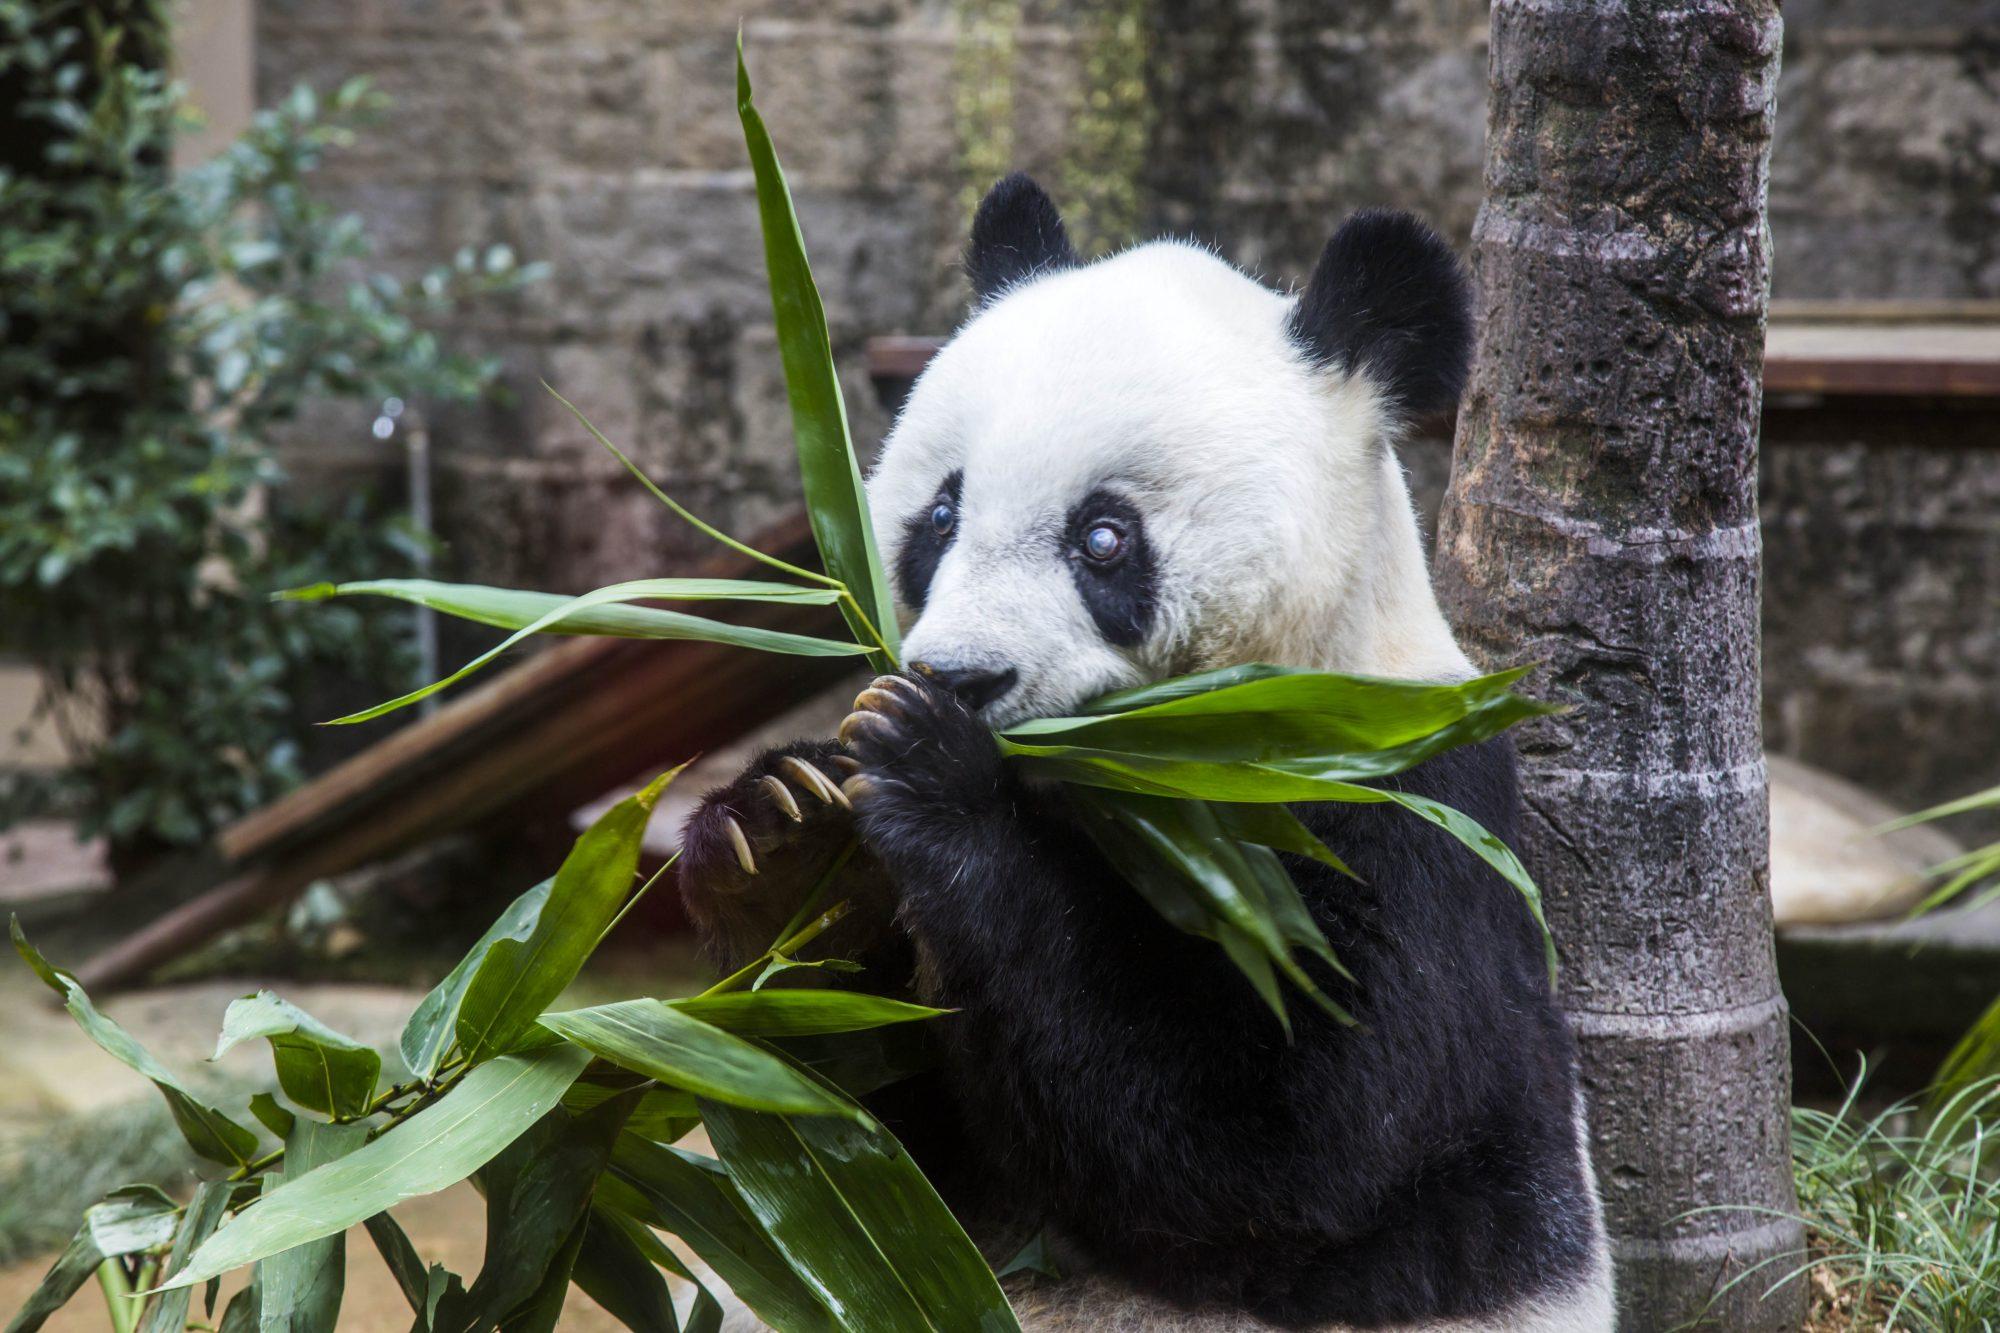 Giant Panda Basi Celebrates 35th Birthday In China